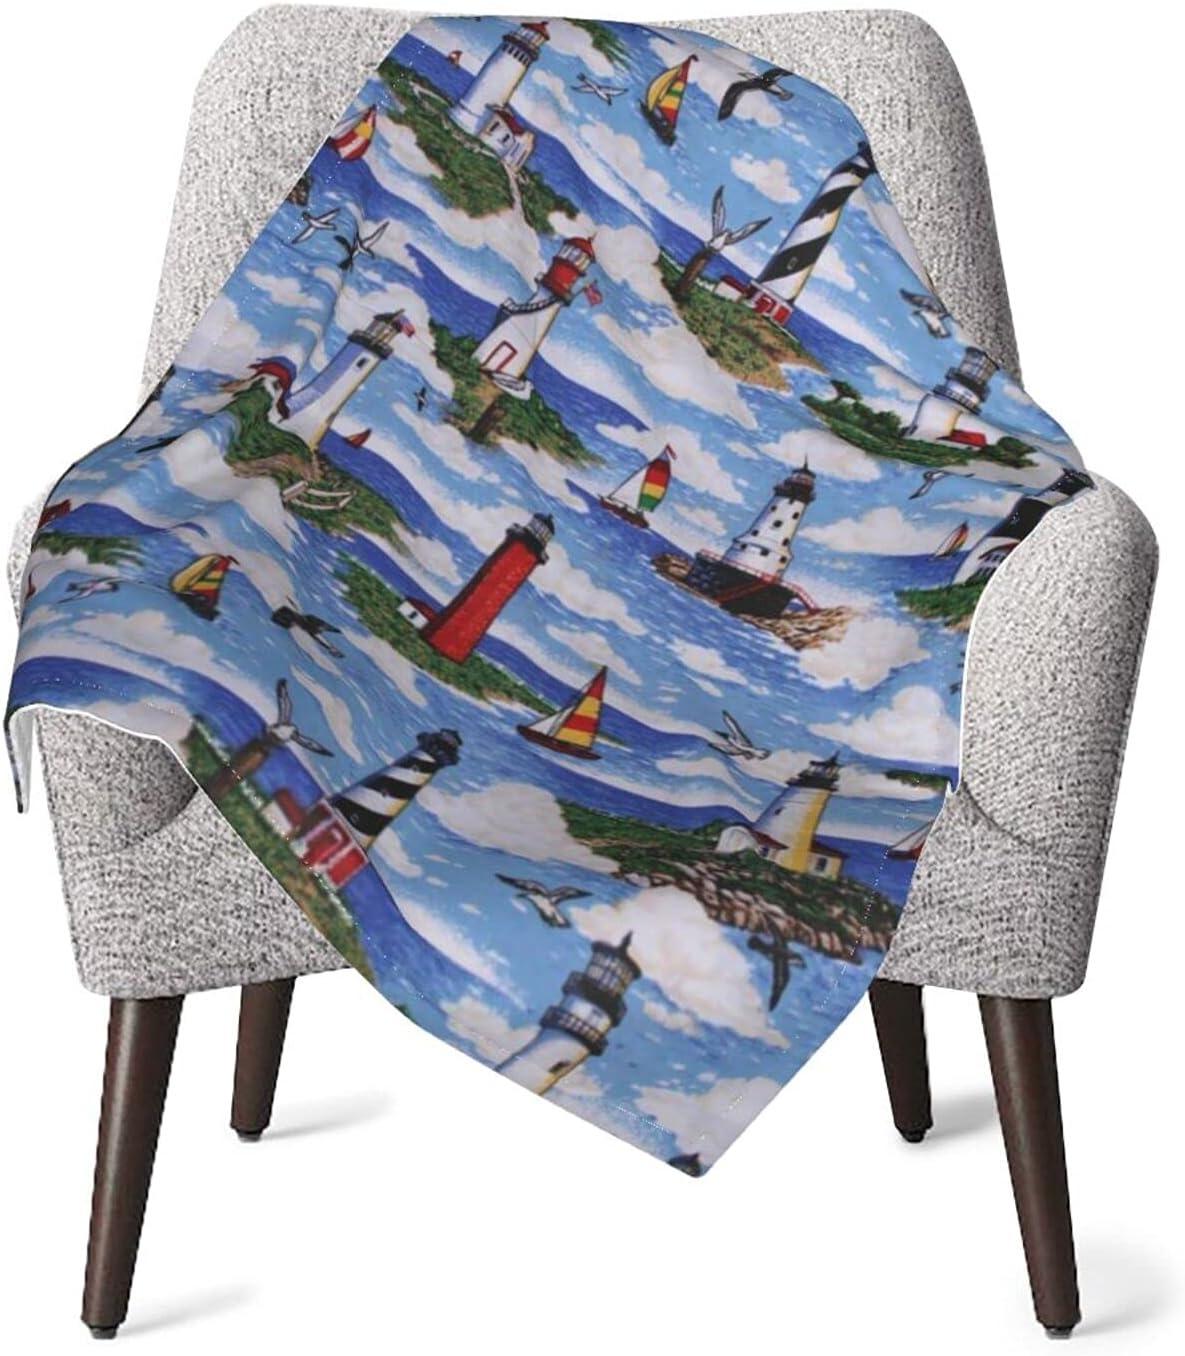 JZDACH Unisex Baby Receiving Lighthouses Superlatite Big Sable Blanket High quality Scene